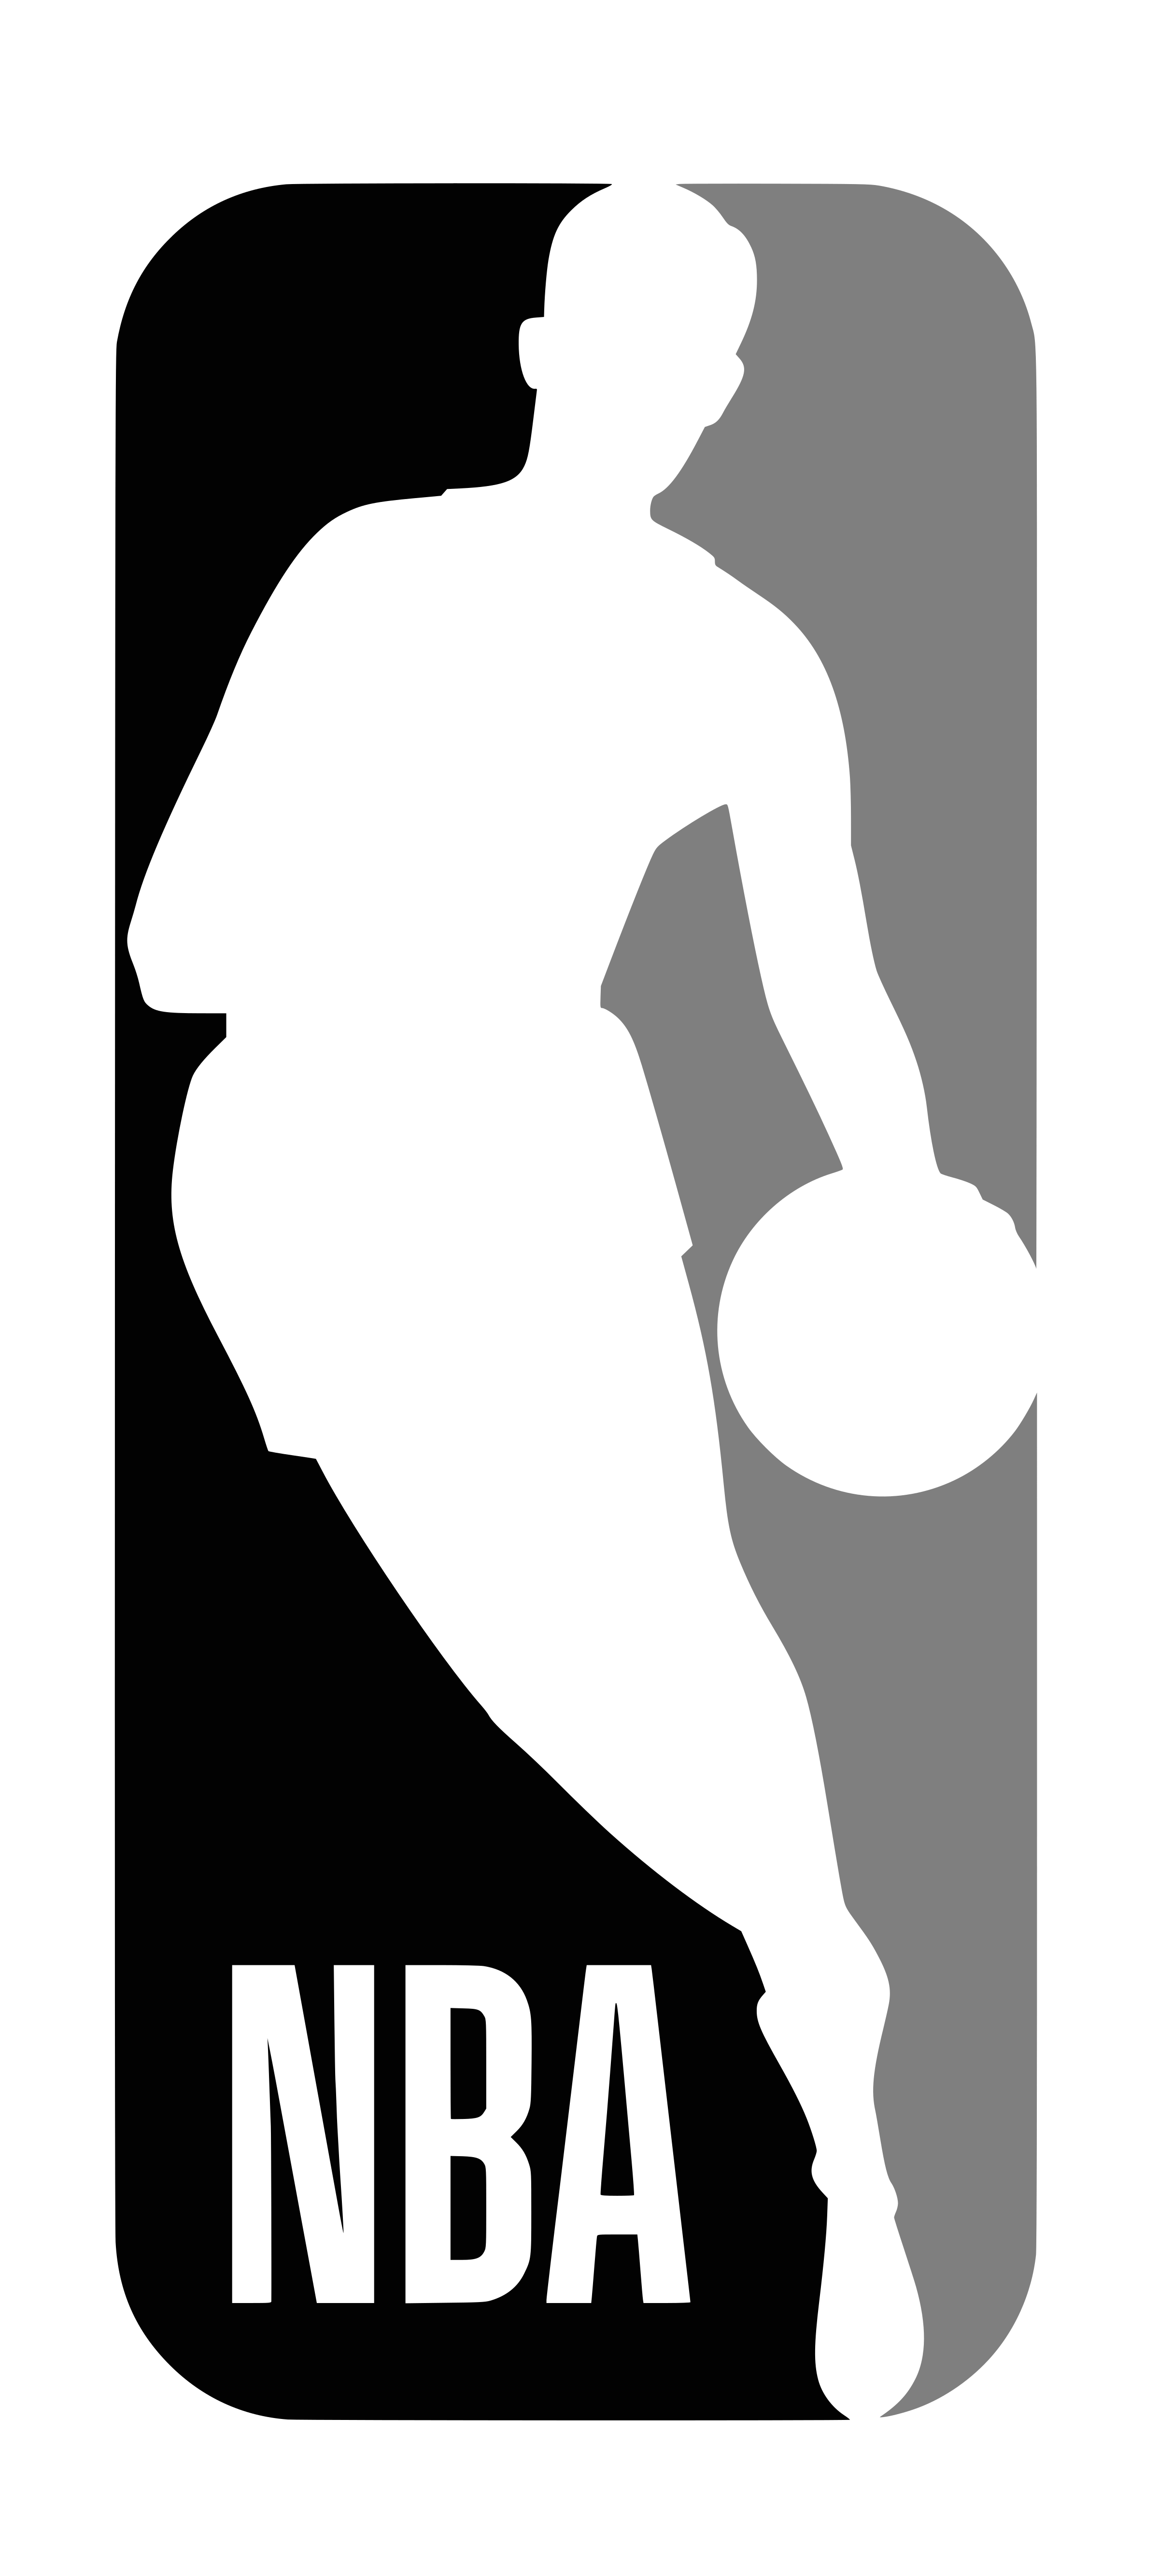 NBA Logo PNG Transparent & SVG Vector - Freebie Supply